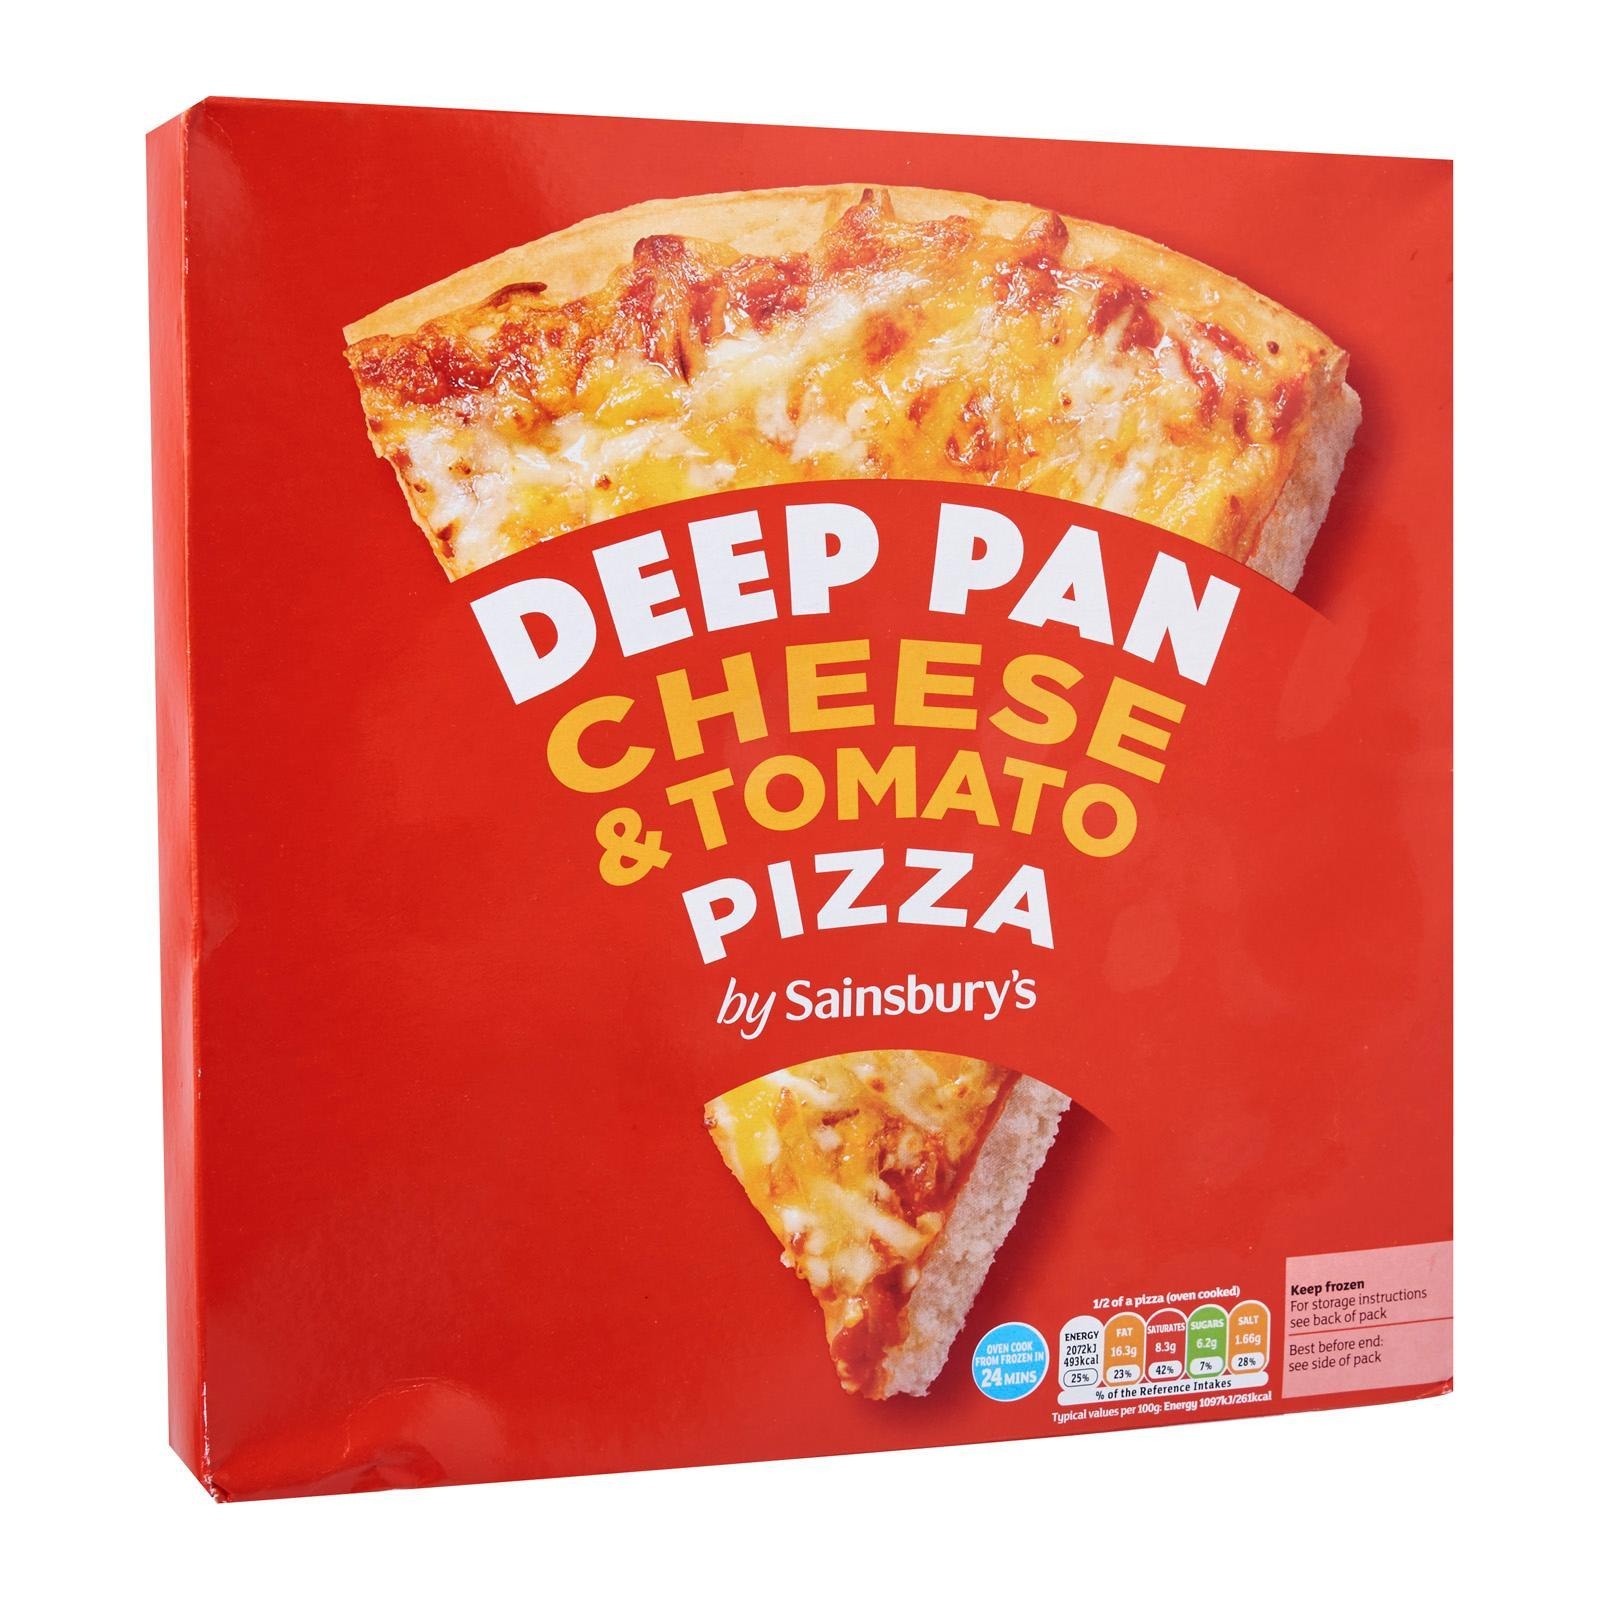 Sainsbury's Deep Pan Cheese And Tomato Pizza - Frozen